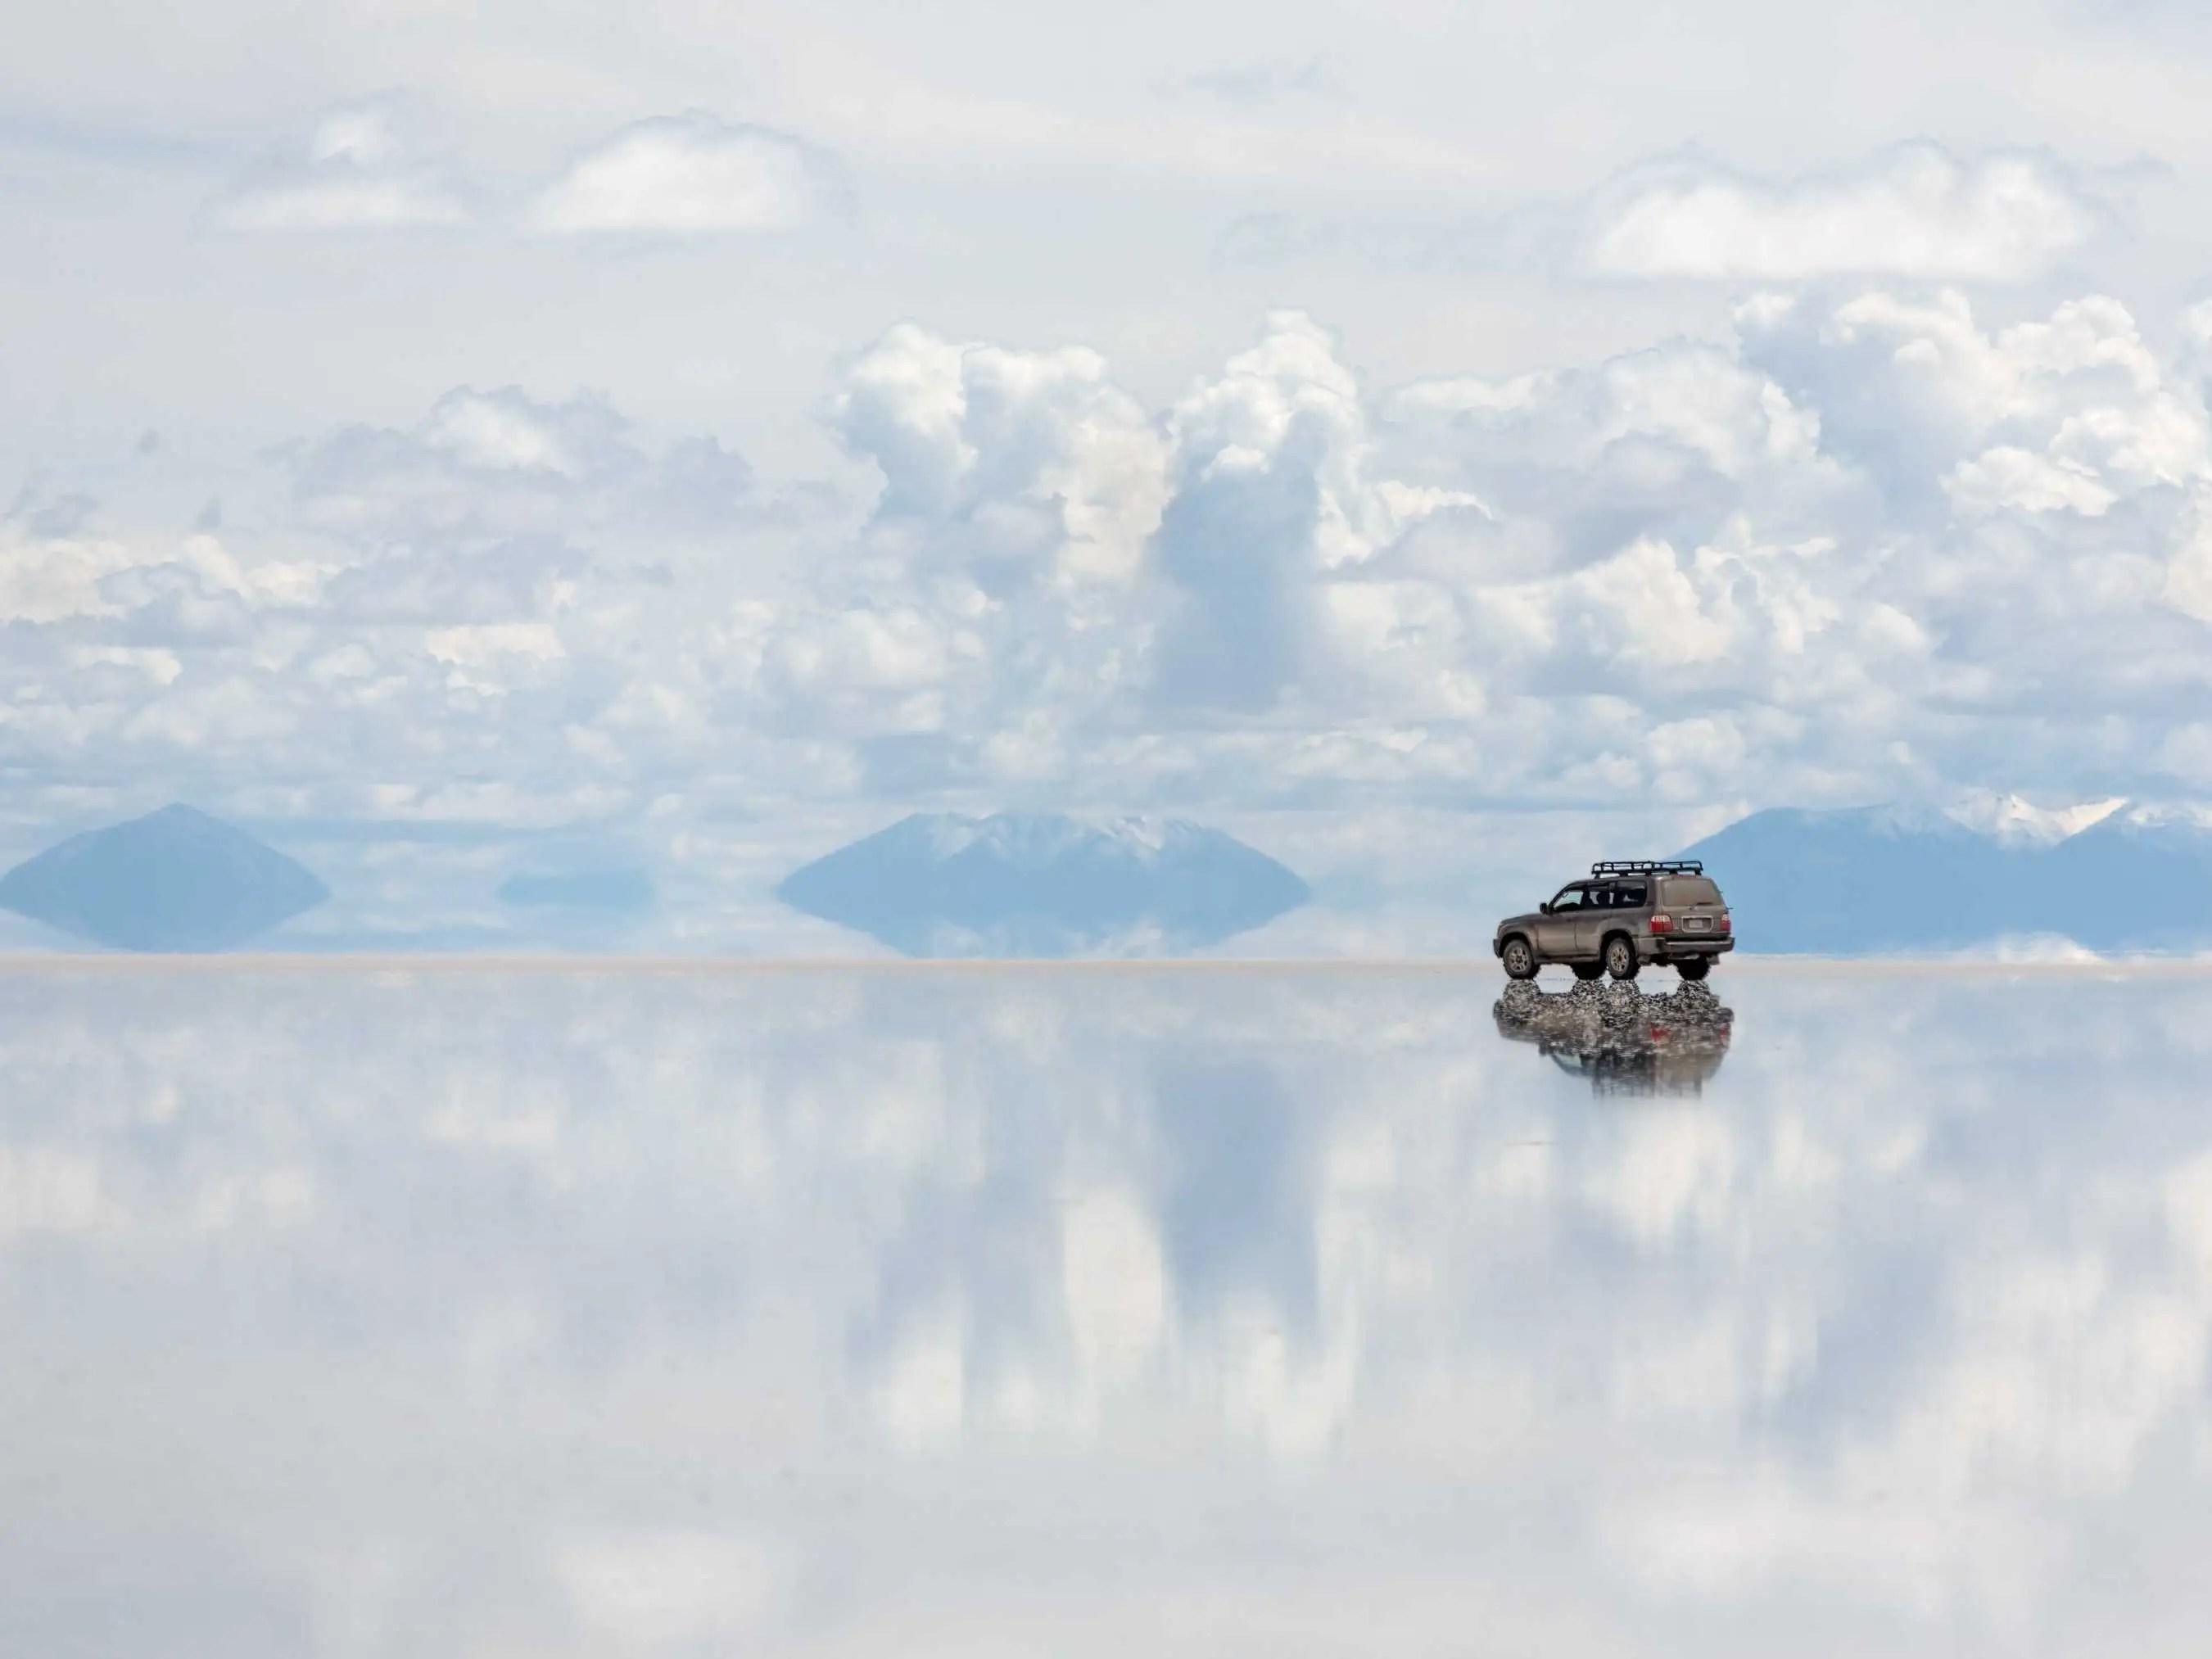 Four wheel drive across Bolivia's Salar de Uyuni, the largest salt flat in the world.